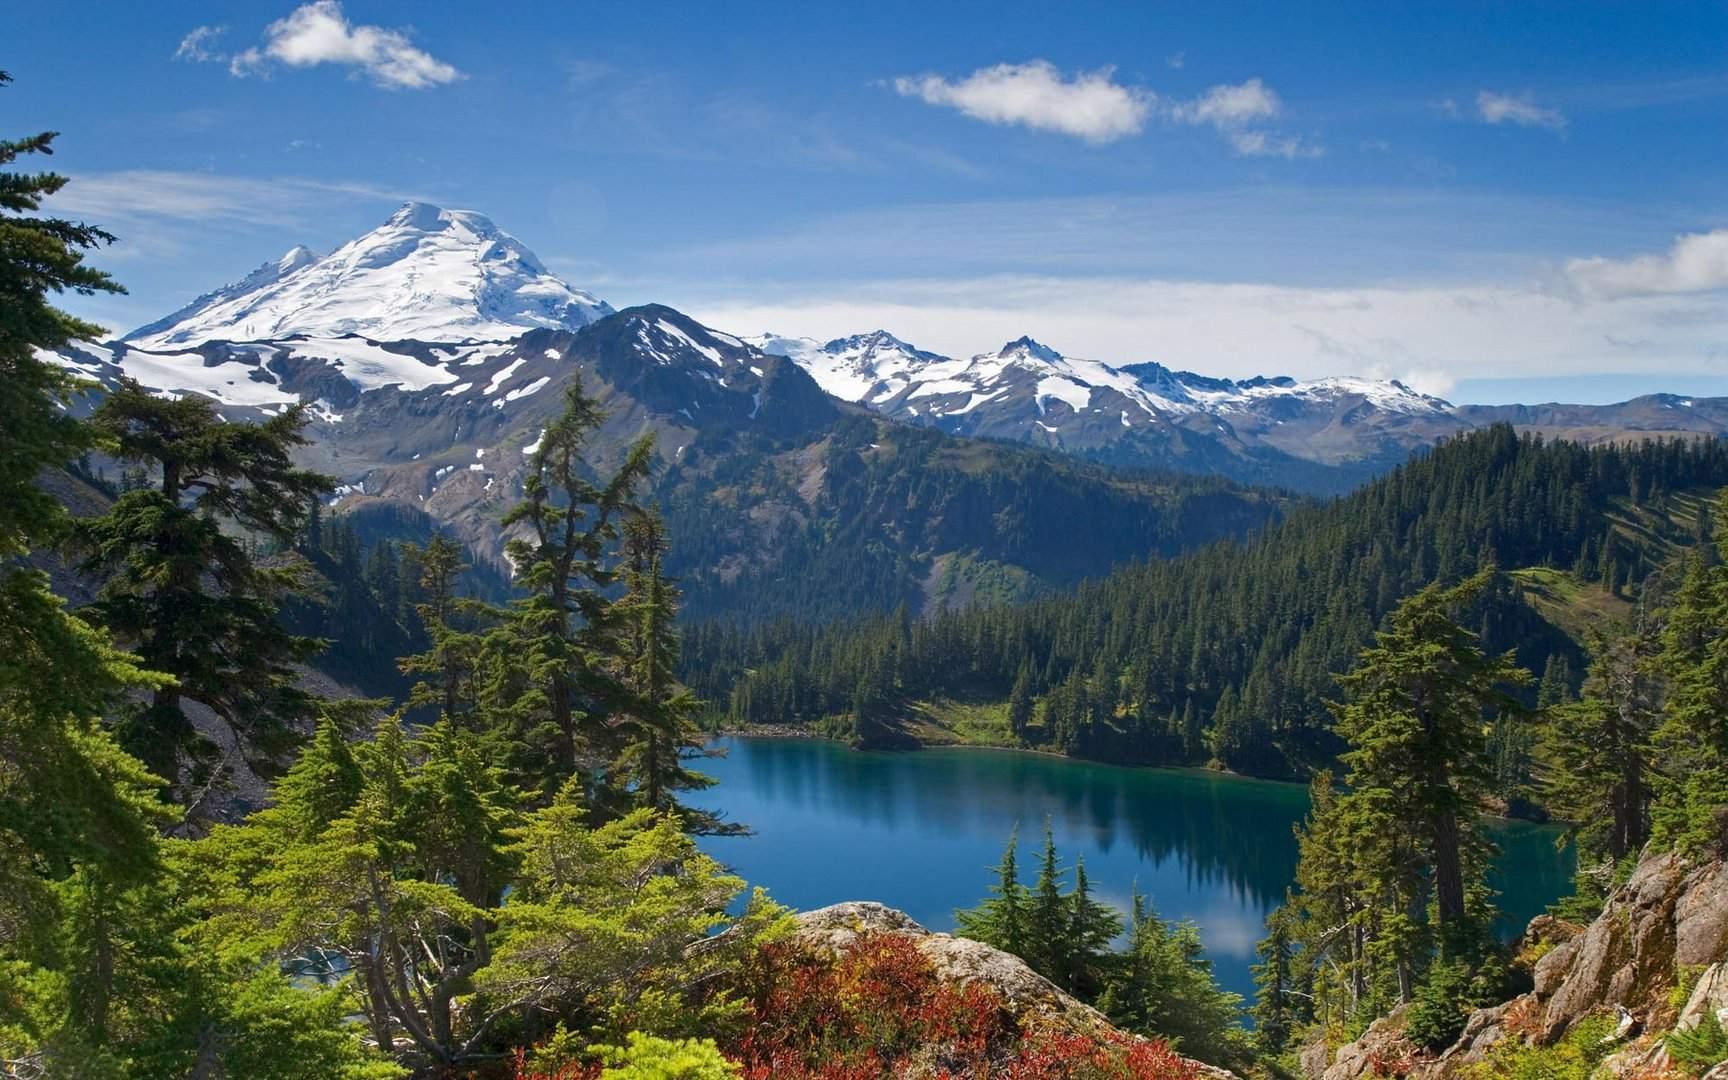 Download Mountains Wallpaper wallpaper Mountain Landscape 1728x1080